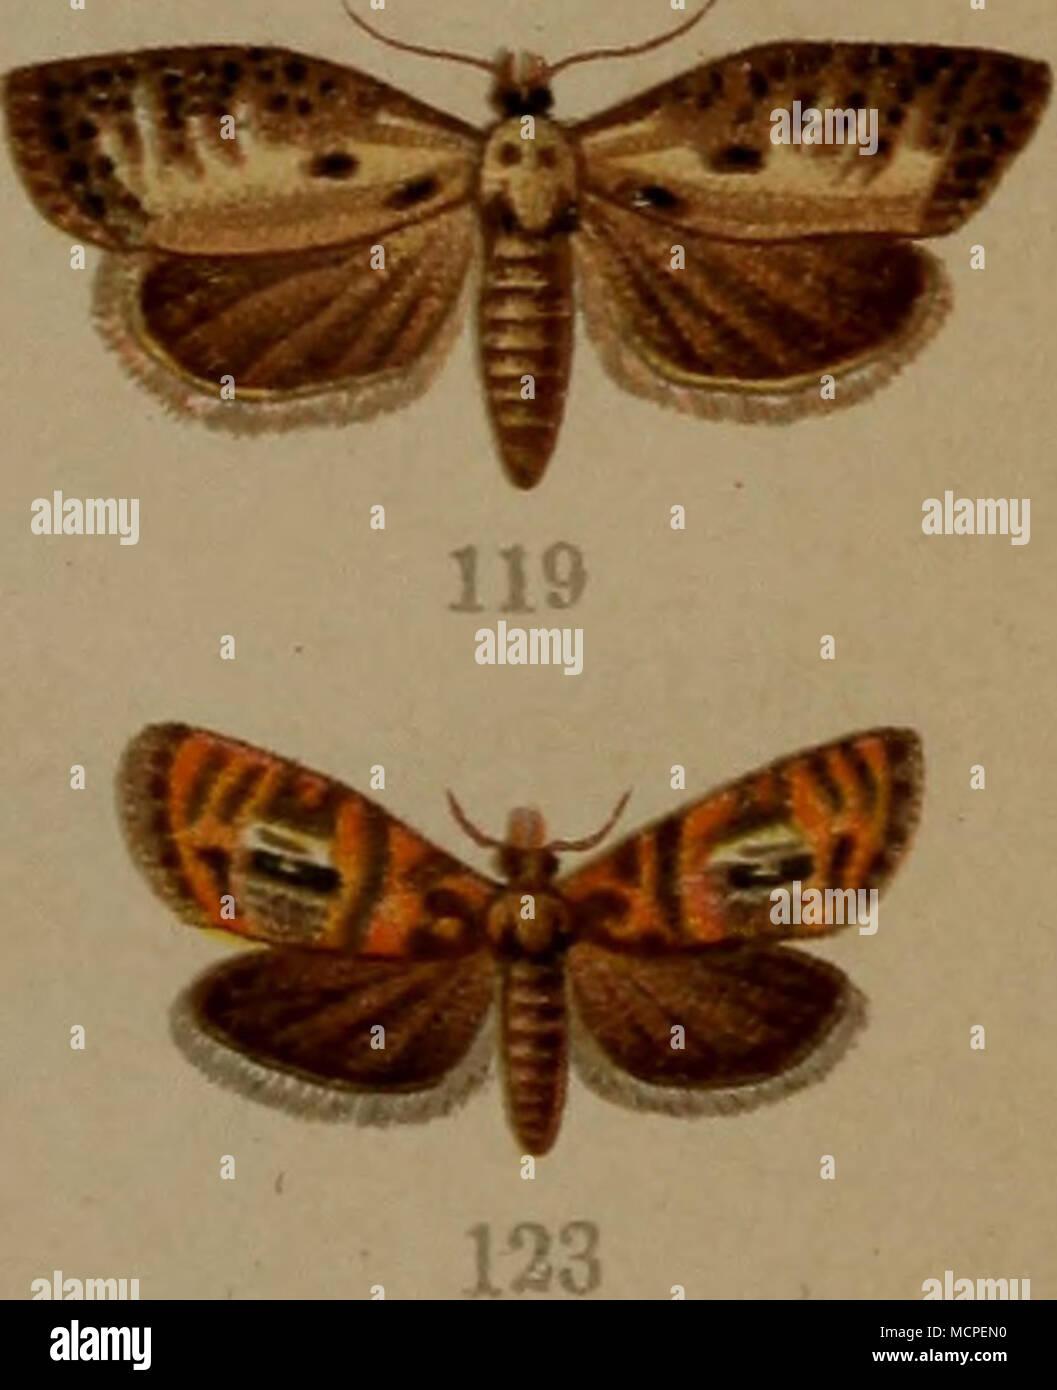 . 87. Acalla emargana v. effractana Froel. — 88. Acalla hastiana L.. — 88a Acalla hastiana ab. combustana Hb. — 89. Acalla niveana F. — 90. Acalla schalleriana F. — 91. Acalla ferrugana Tr. — 92. Acalla holmiana L. - 93. Dichelia gnomana Cl. — 94. Oeaophthim pilleriana Schitt. — 95. Cacoecia piceana L. (f. — 96. Cacoecia piceana J . — 97. Cacoecia podana Sc. er- — 98. Cacoecia xylosteana Jj. (f. — 99. Cacoecia xylosteana J . — 100. Cacoecia rosana L. (/• — 101. Cacoecia rosana $ . — 102. Cacoecia sorbiana Hb. $ . — 103. Cacoecia histrionana Froel. — 104. Cacoecia murinana Hb. — 105. Pandemis c - Stock Image